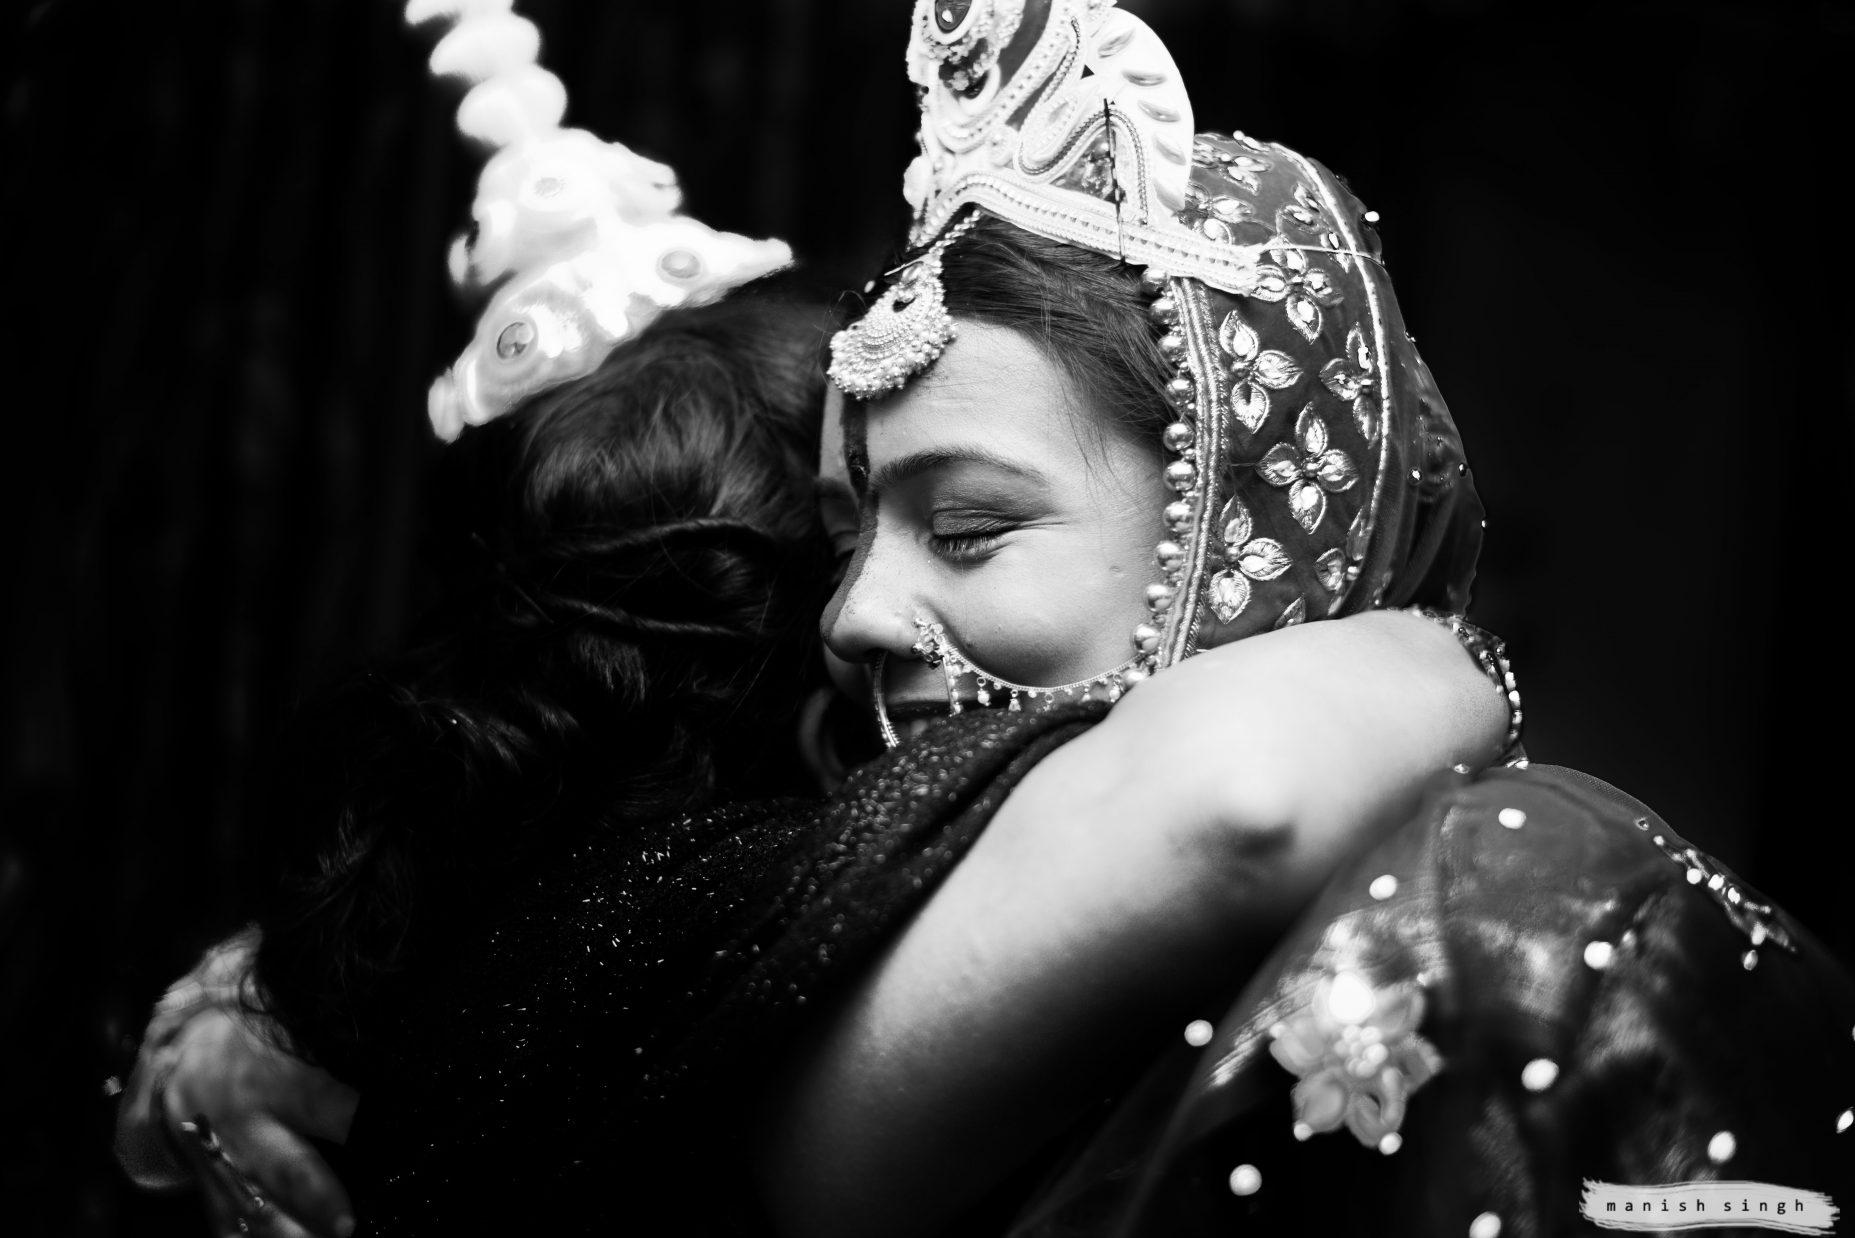 _Manish Singh Photography wedding photographer bhubaneswar _-2 (2)